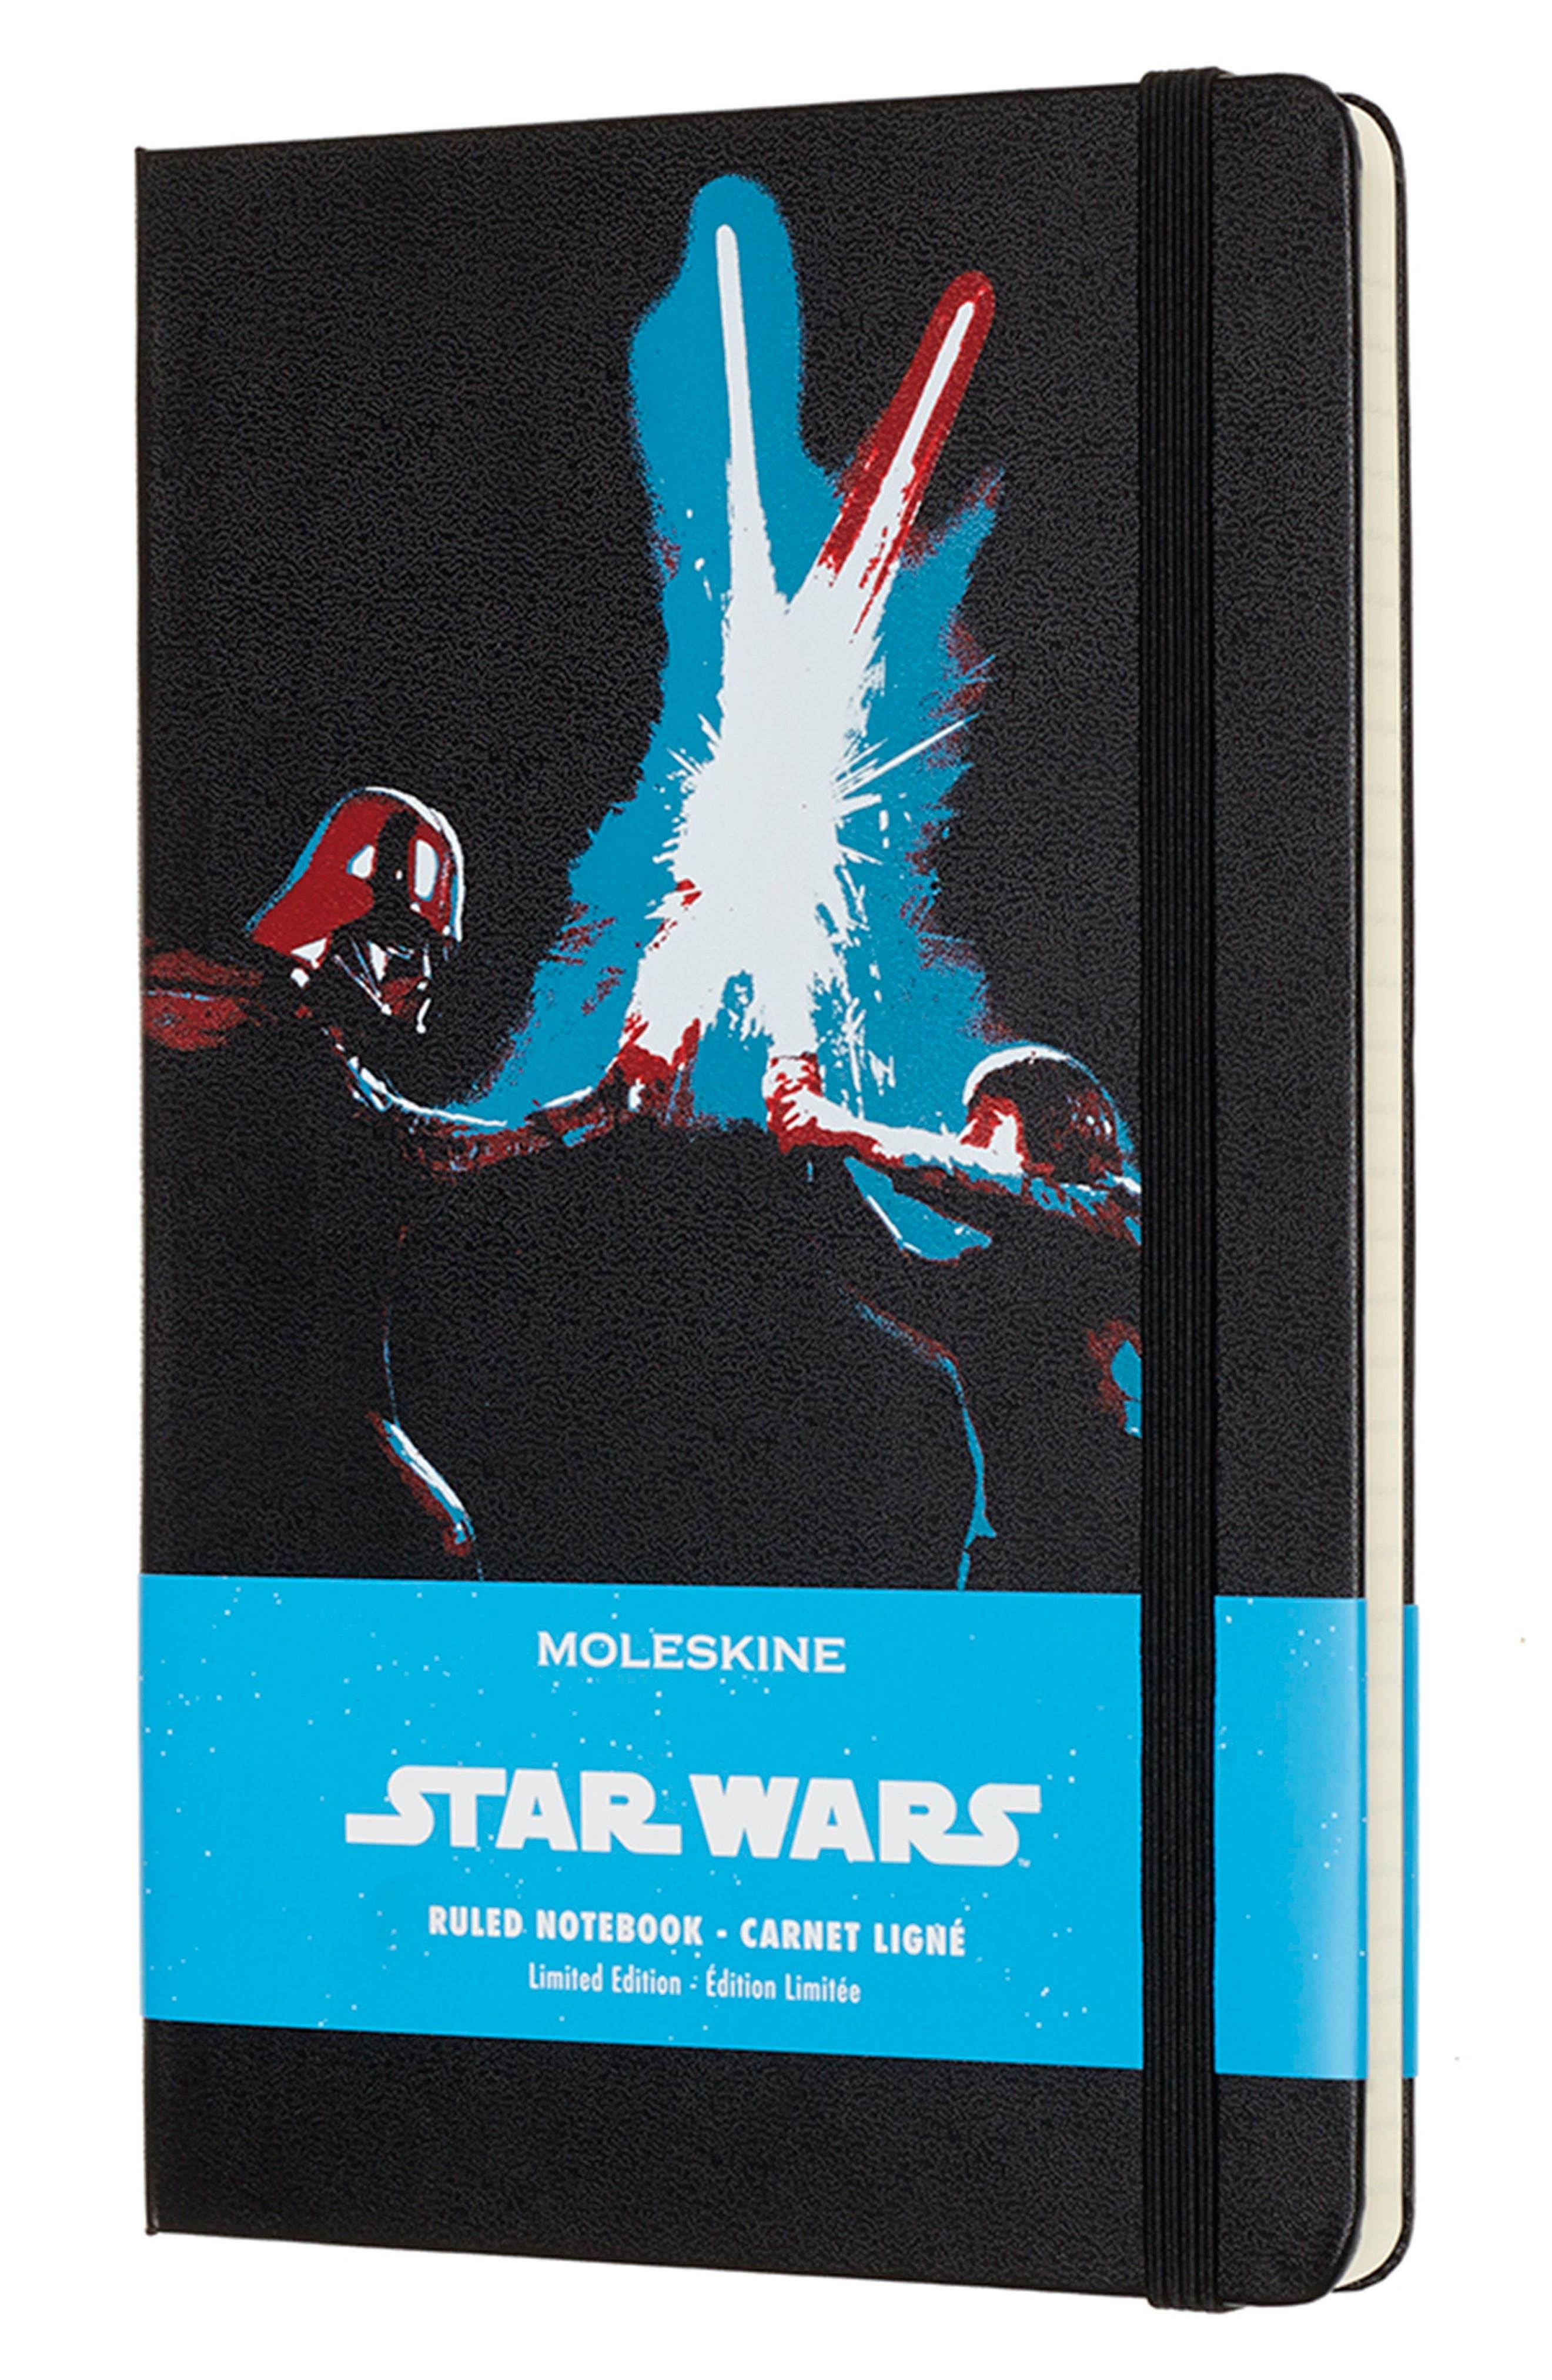 Moleskine® Star Wars™ Limited Edition - Lightsaber Notebook